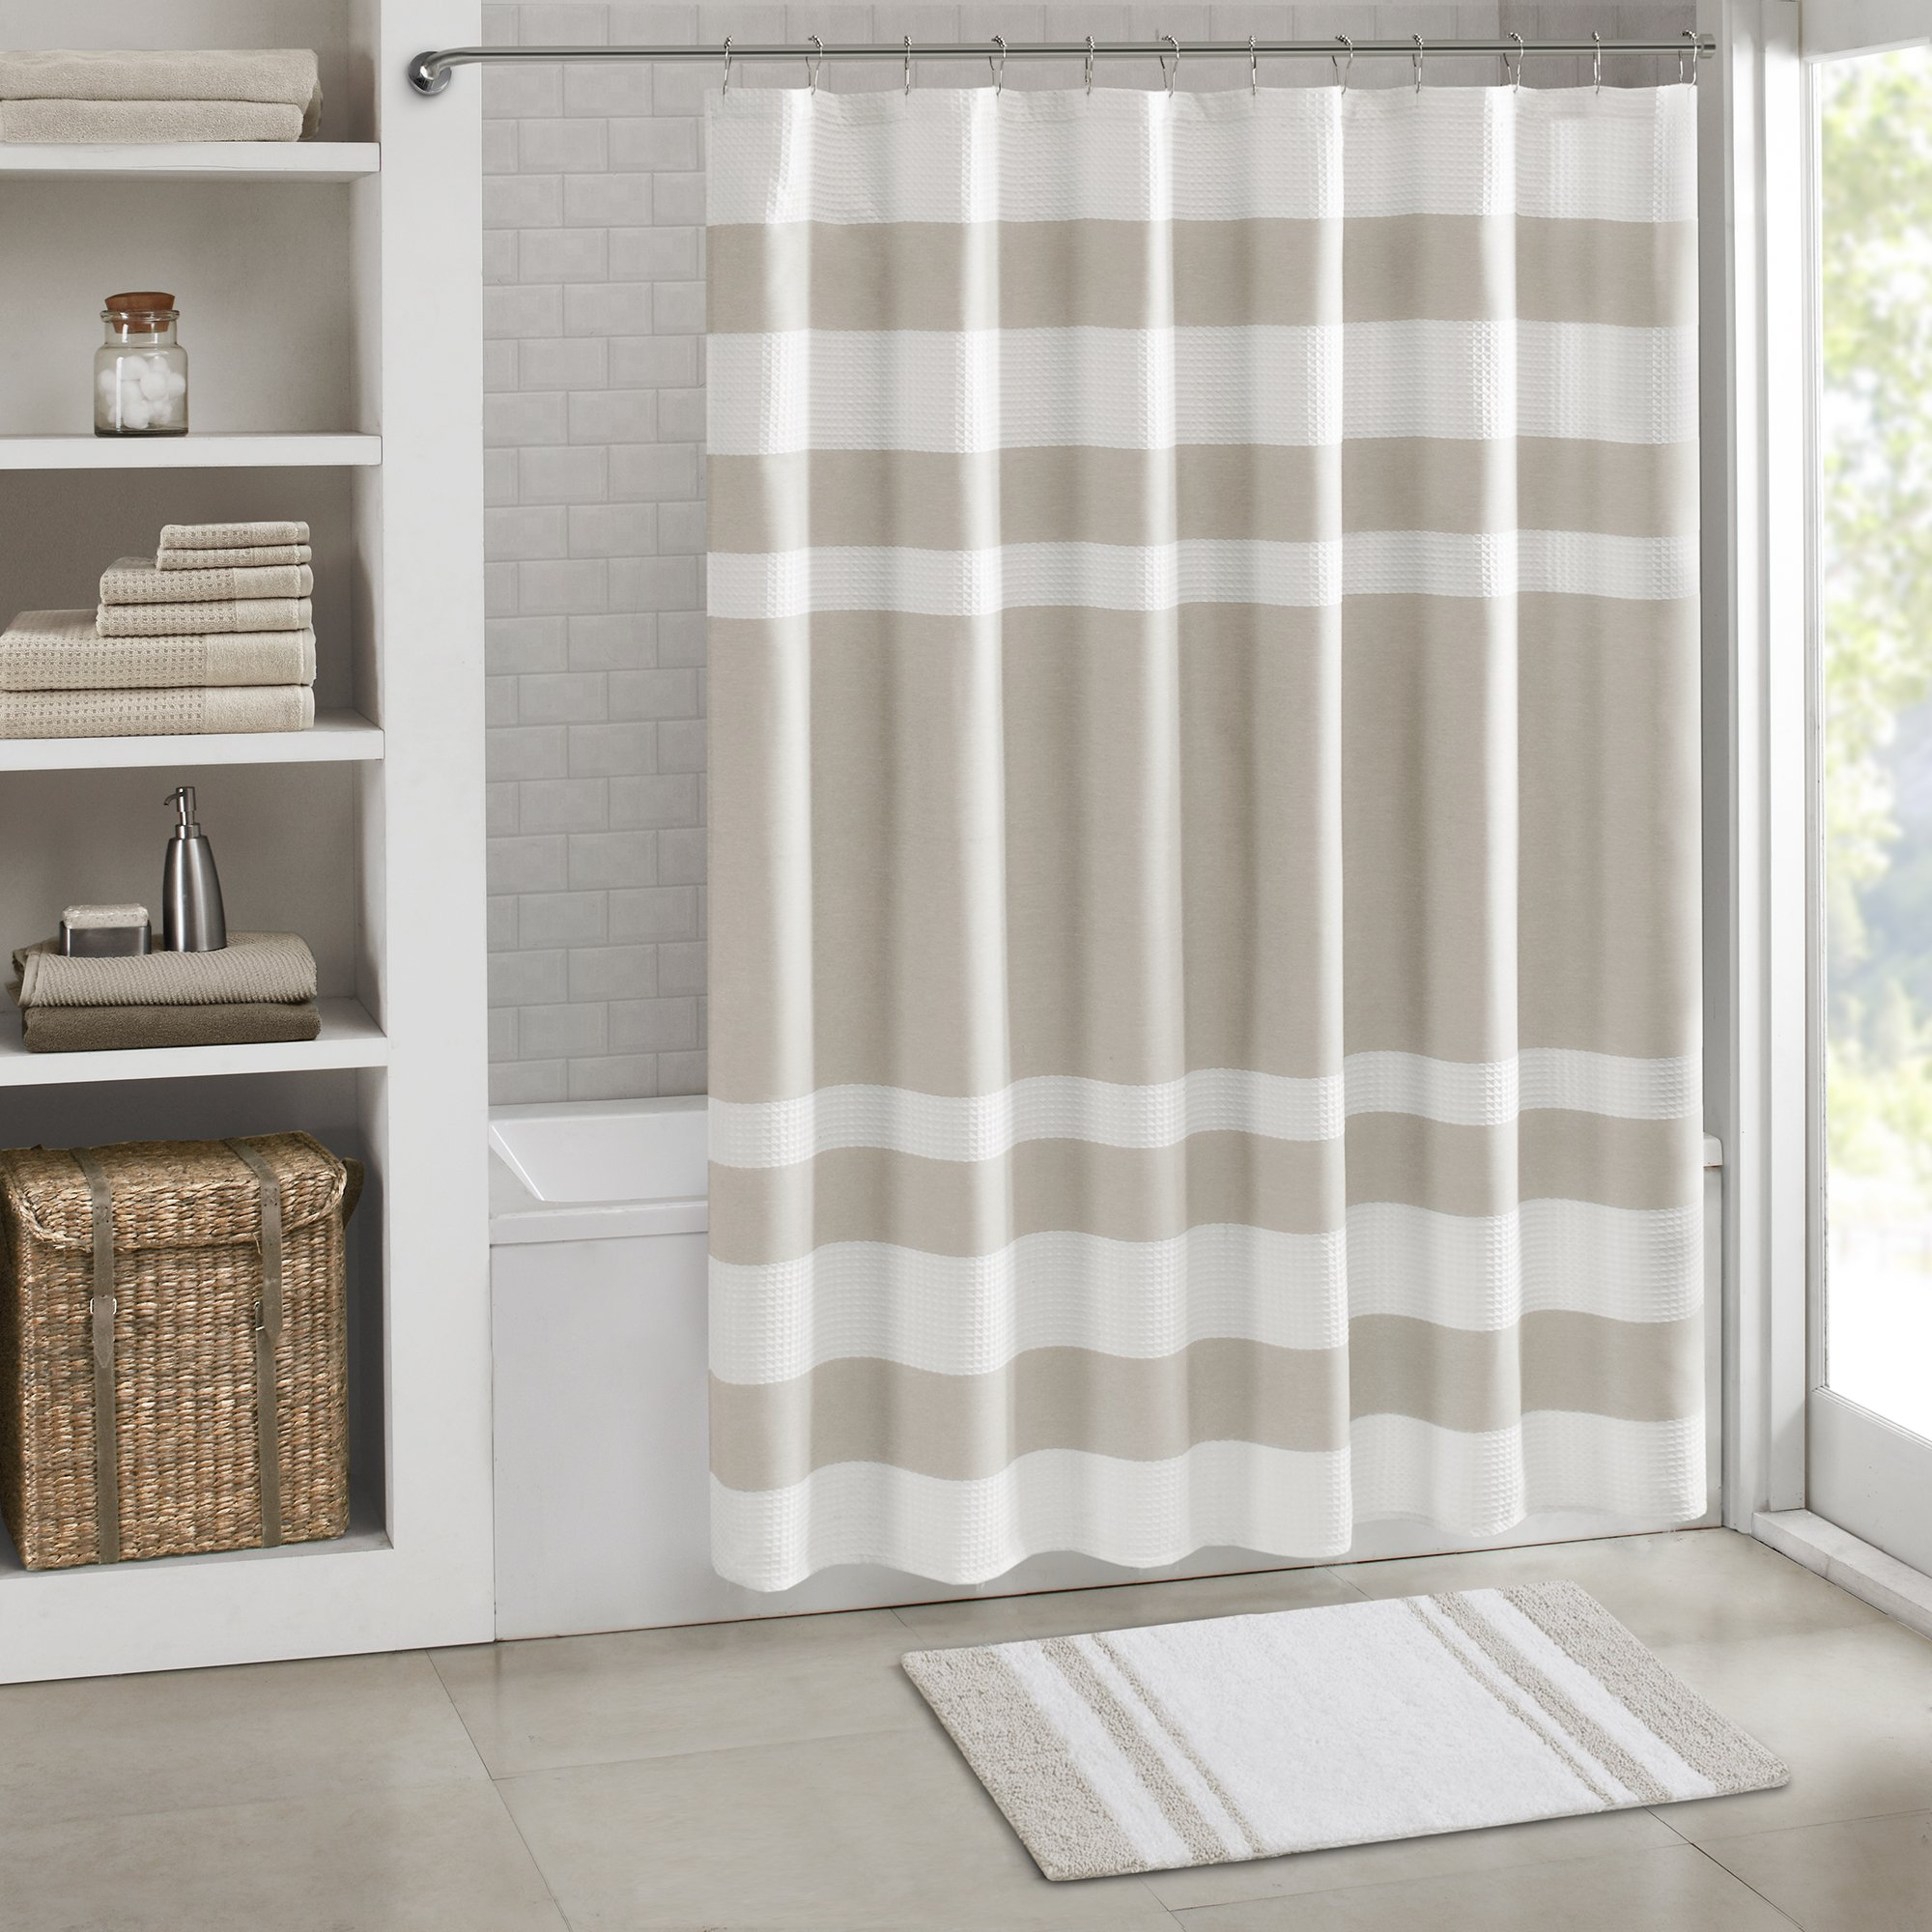 Reversible Bathroom Mats: Reversible Cotton Bath Rugs: Amazon.com